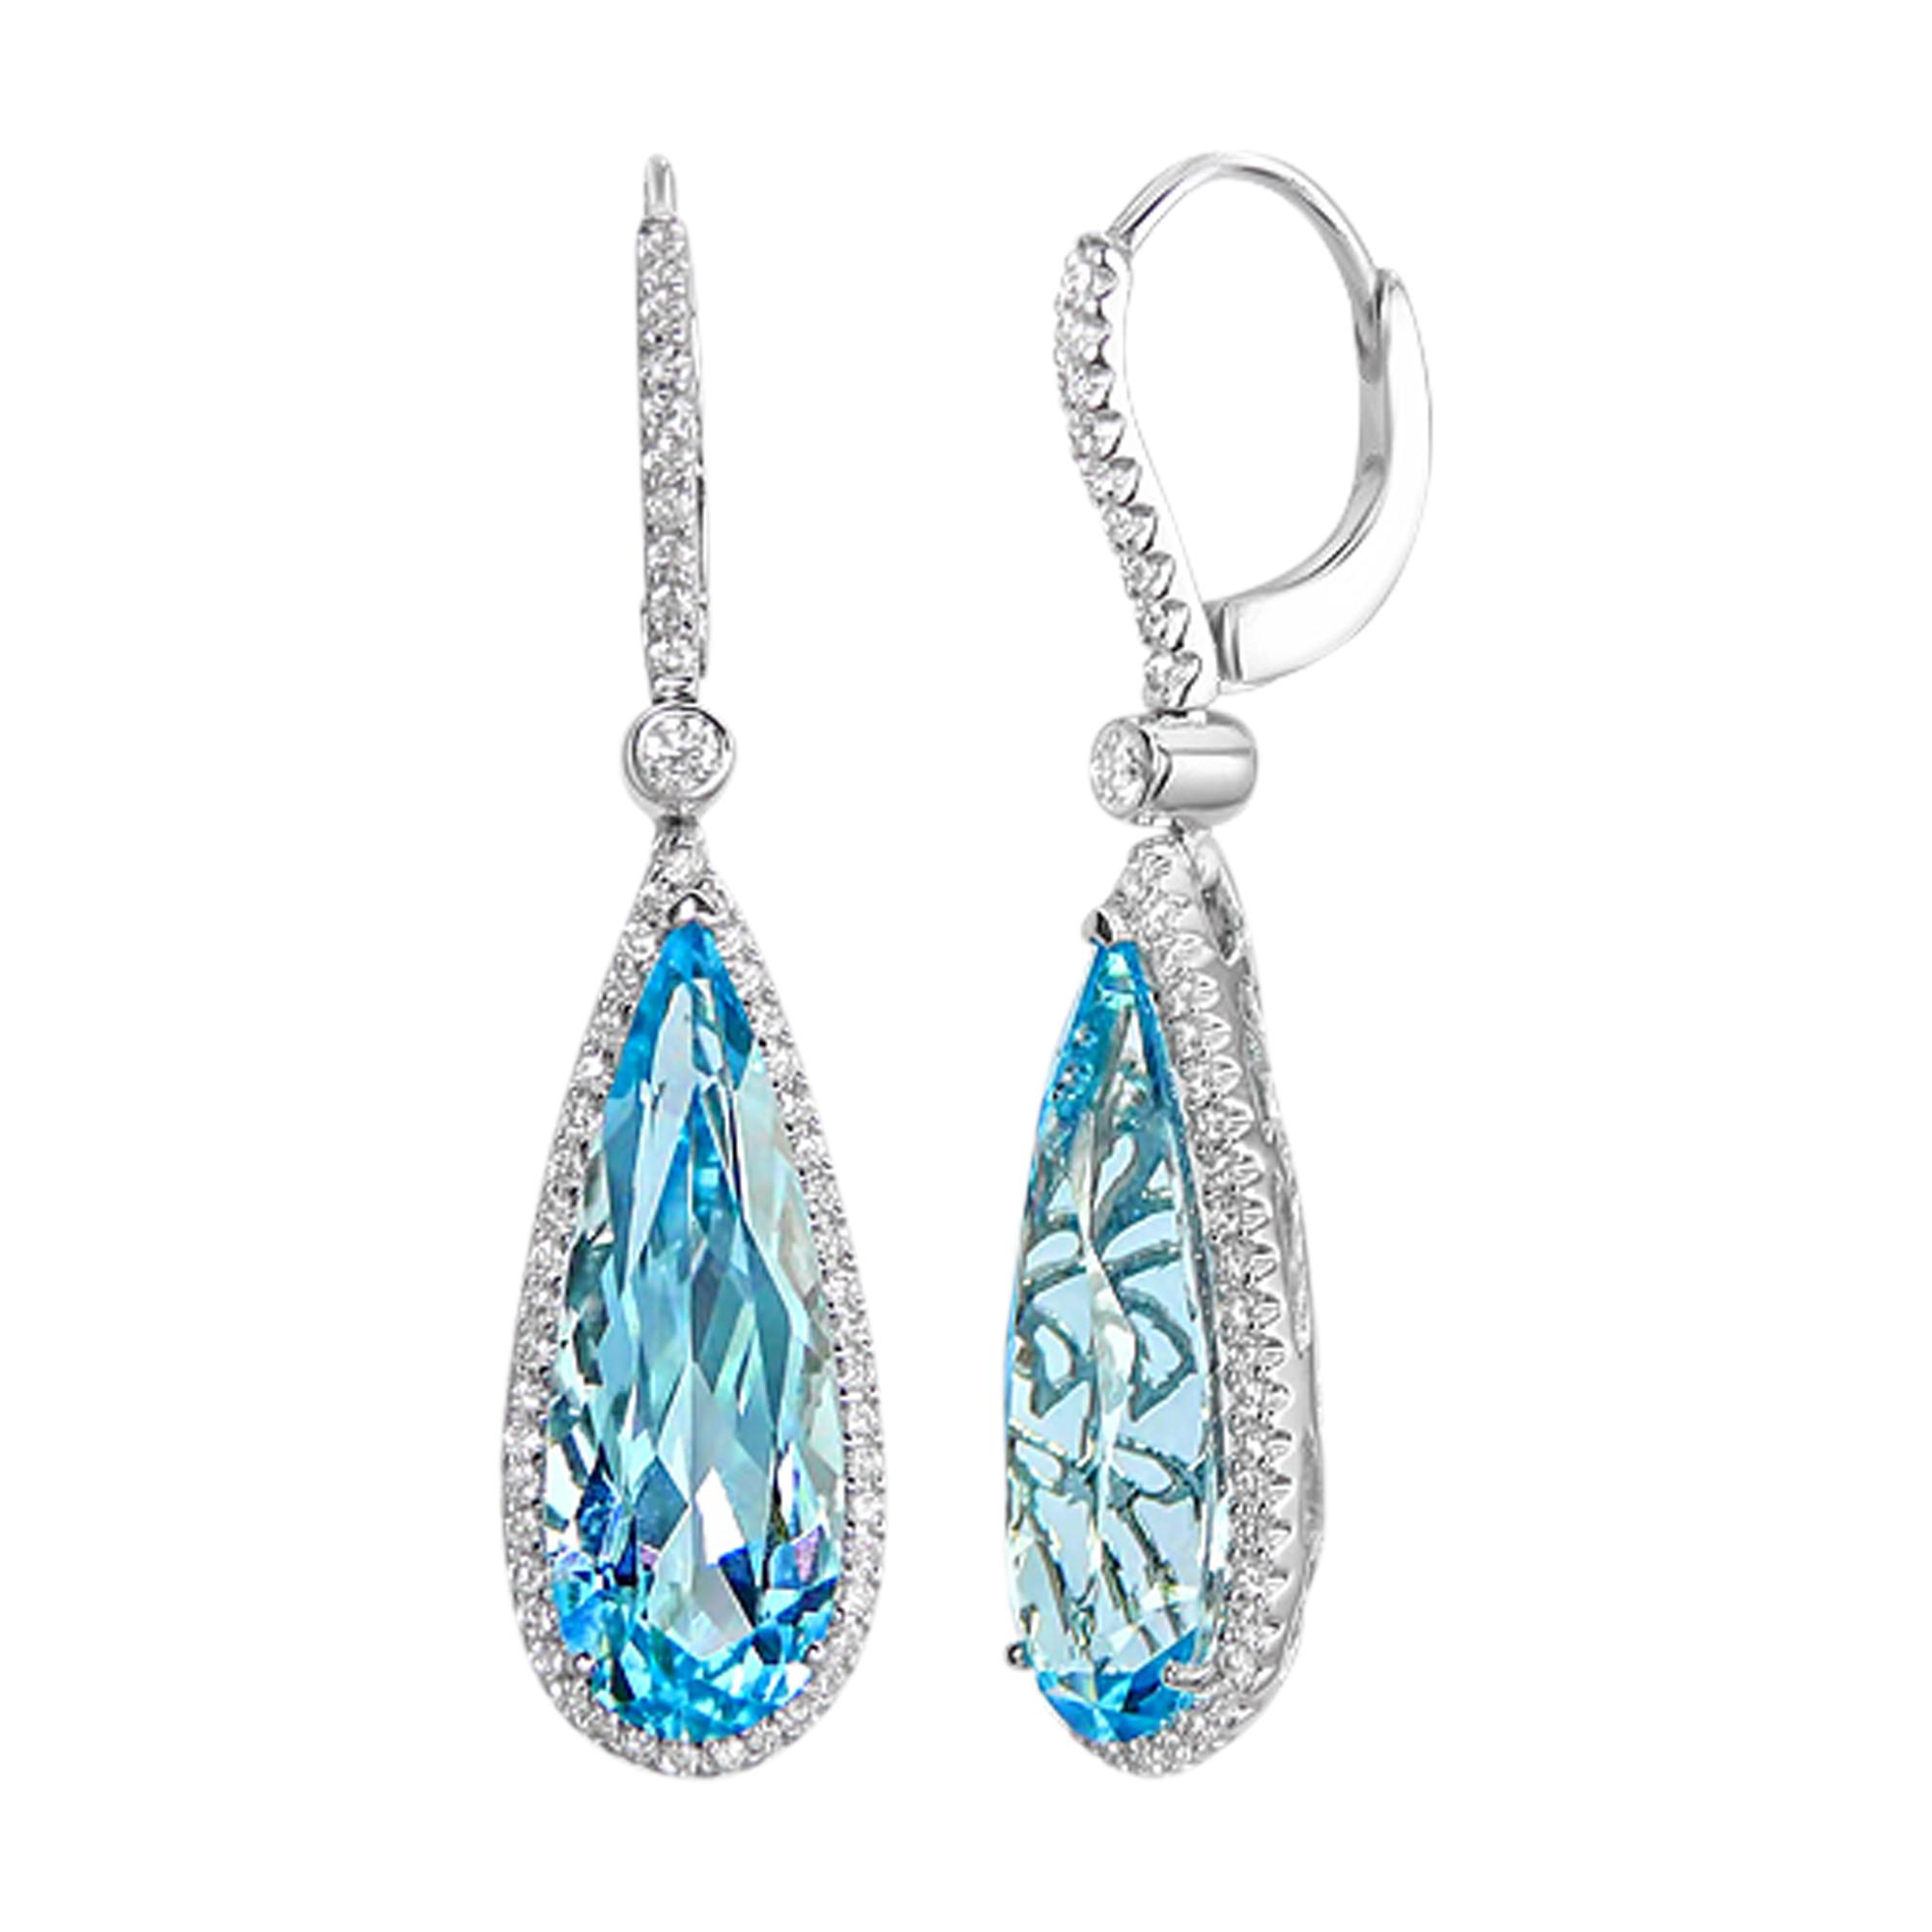 Cross Checkered Cut Pear Blue Topaz & Diamond, 18ct White Gold Drop Earrings